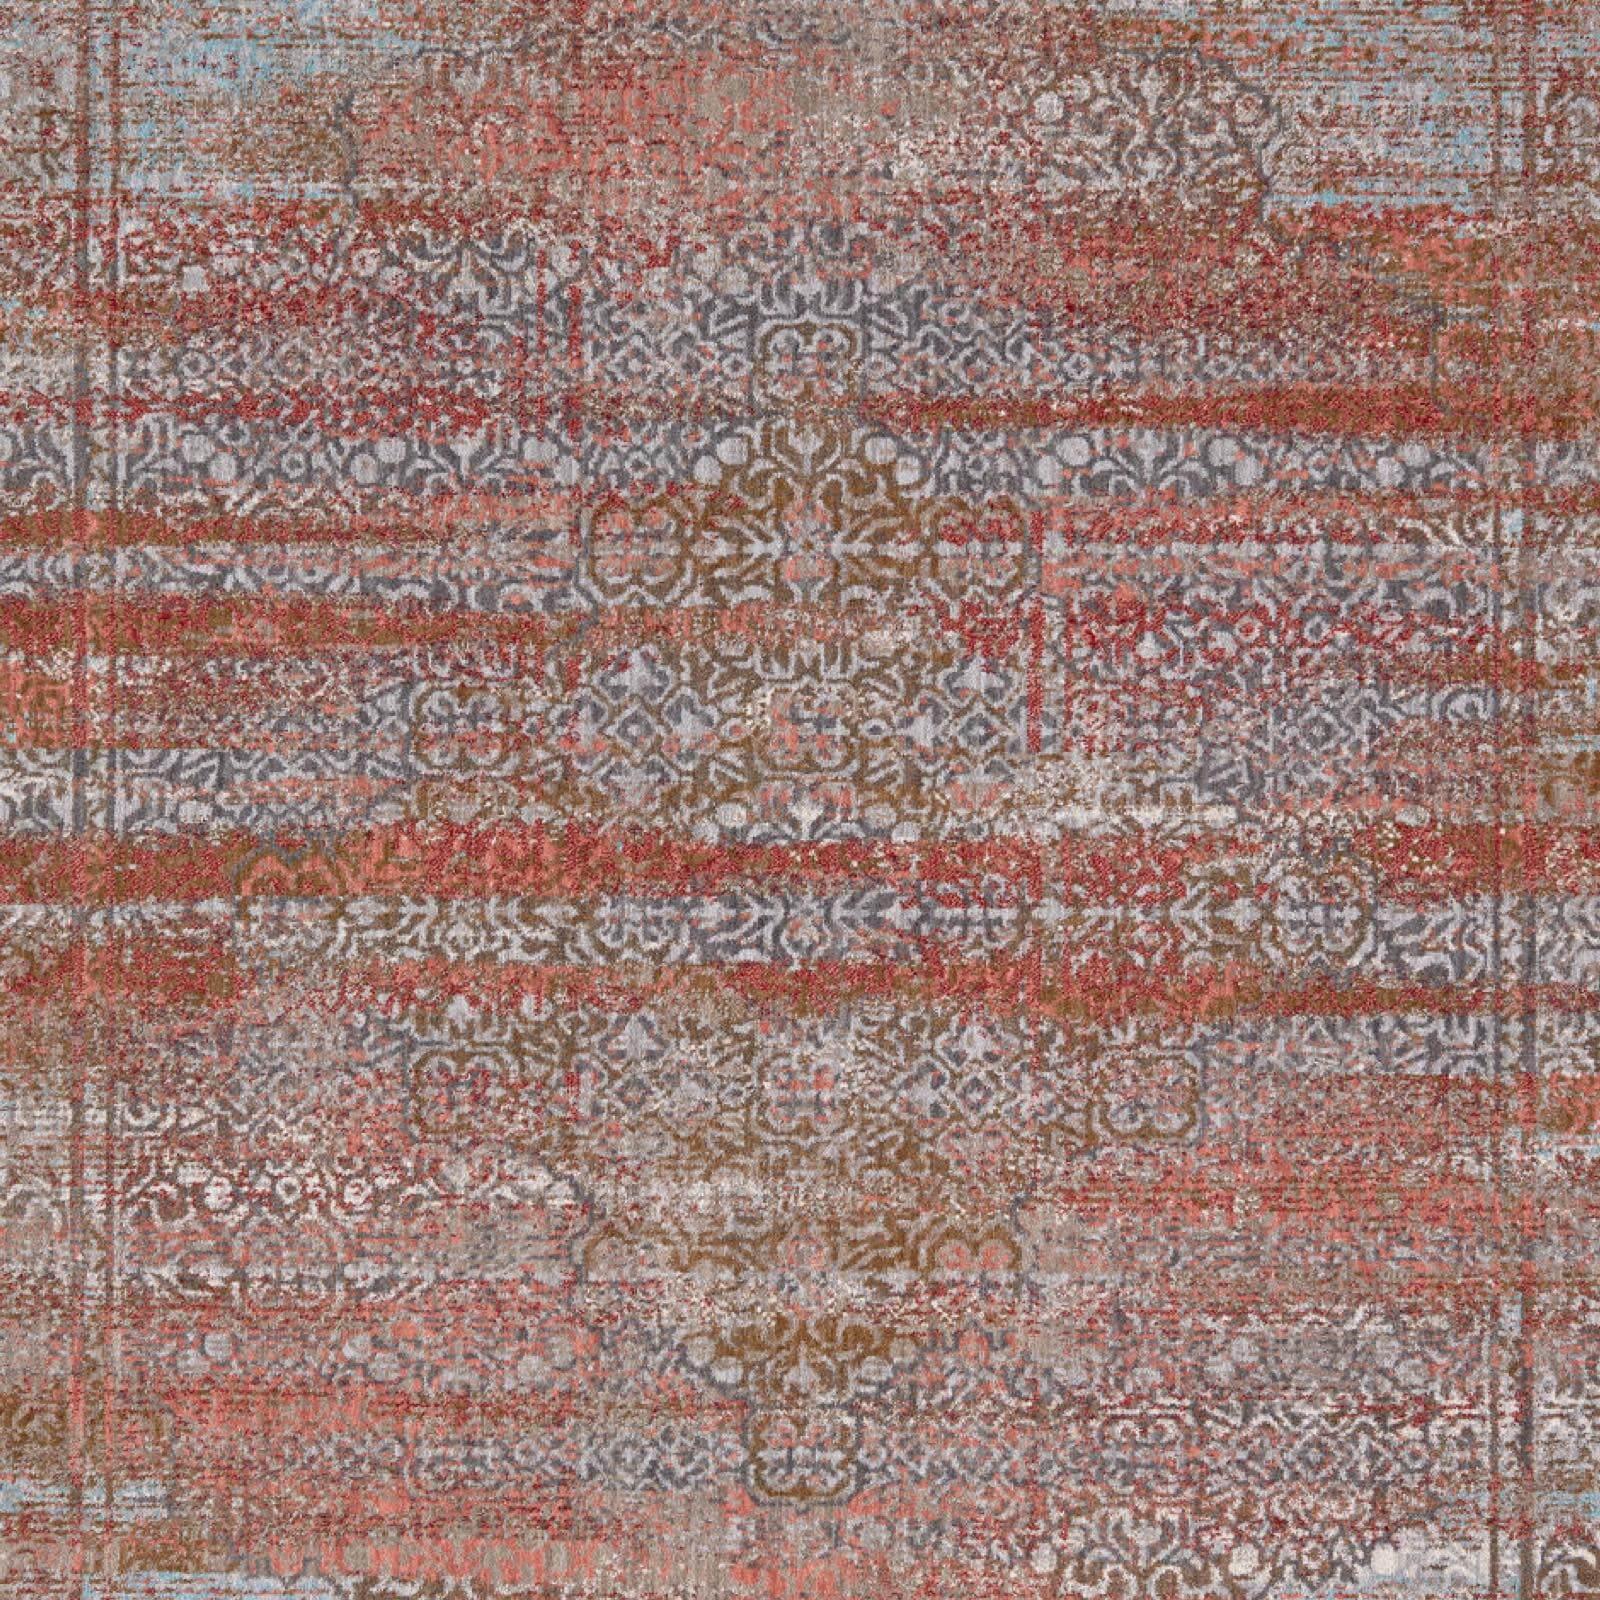 Area Rug | Shans Carpets And Fine Flooring Inc